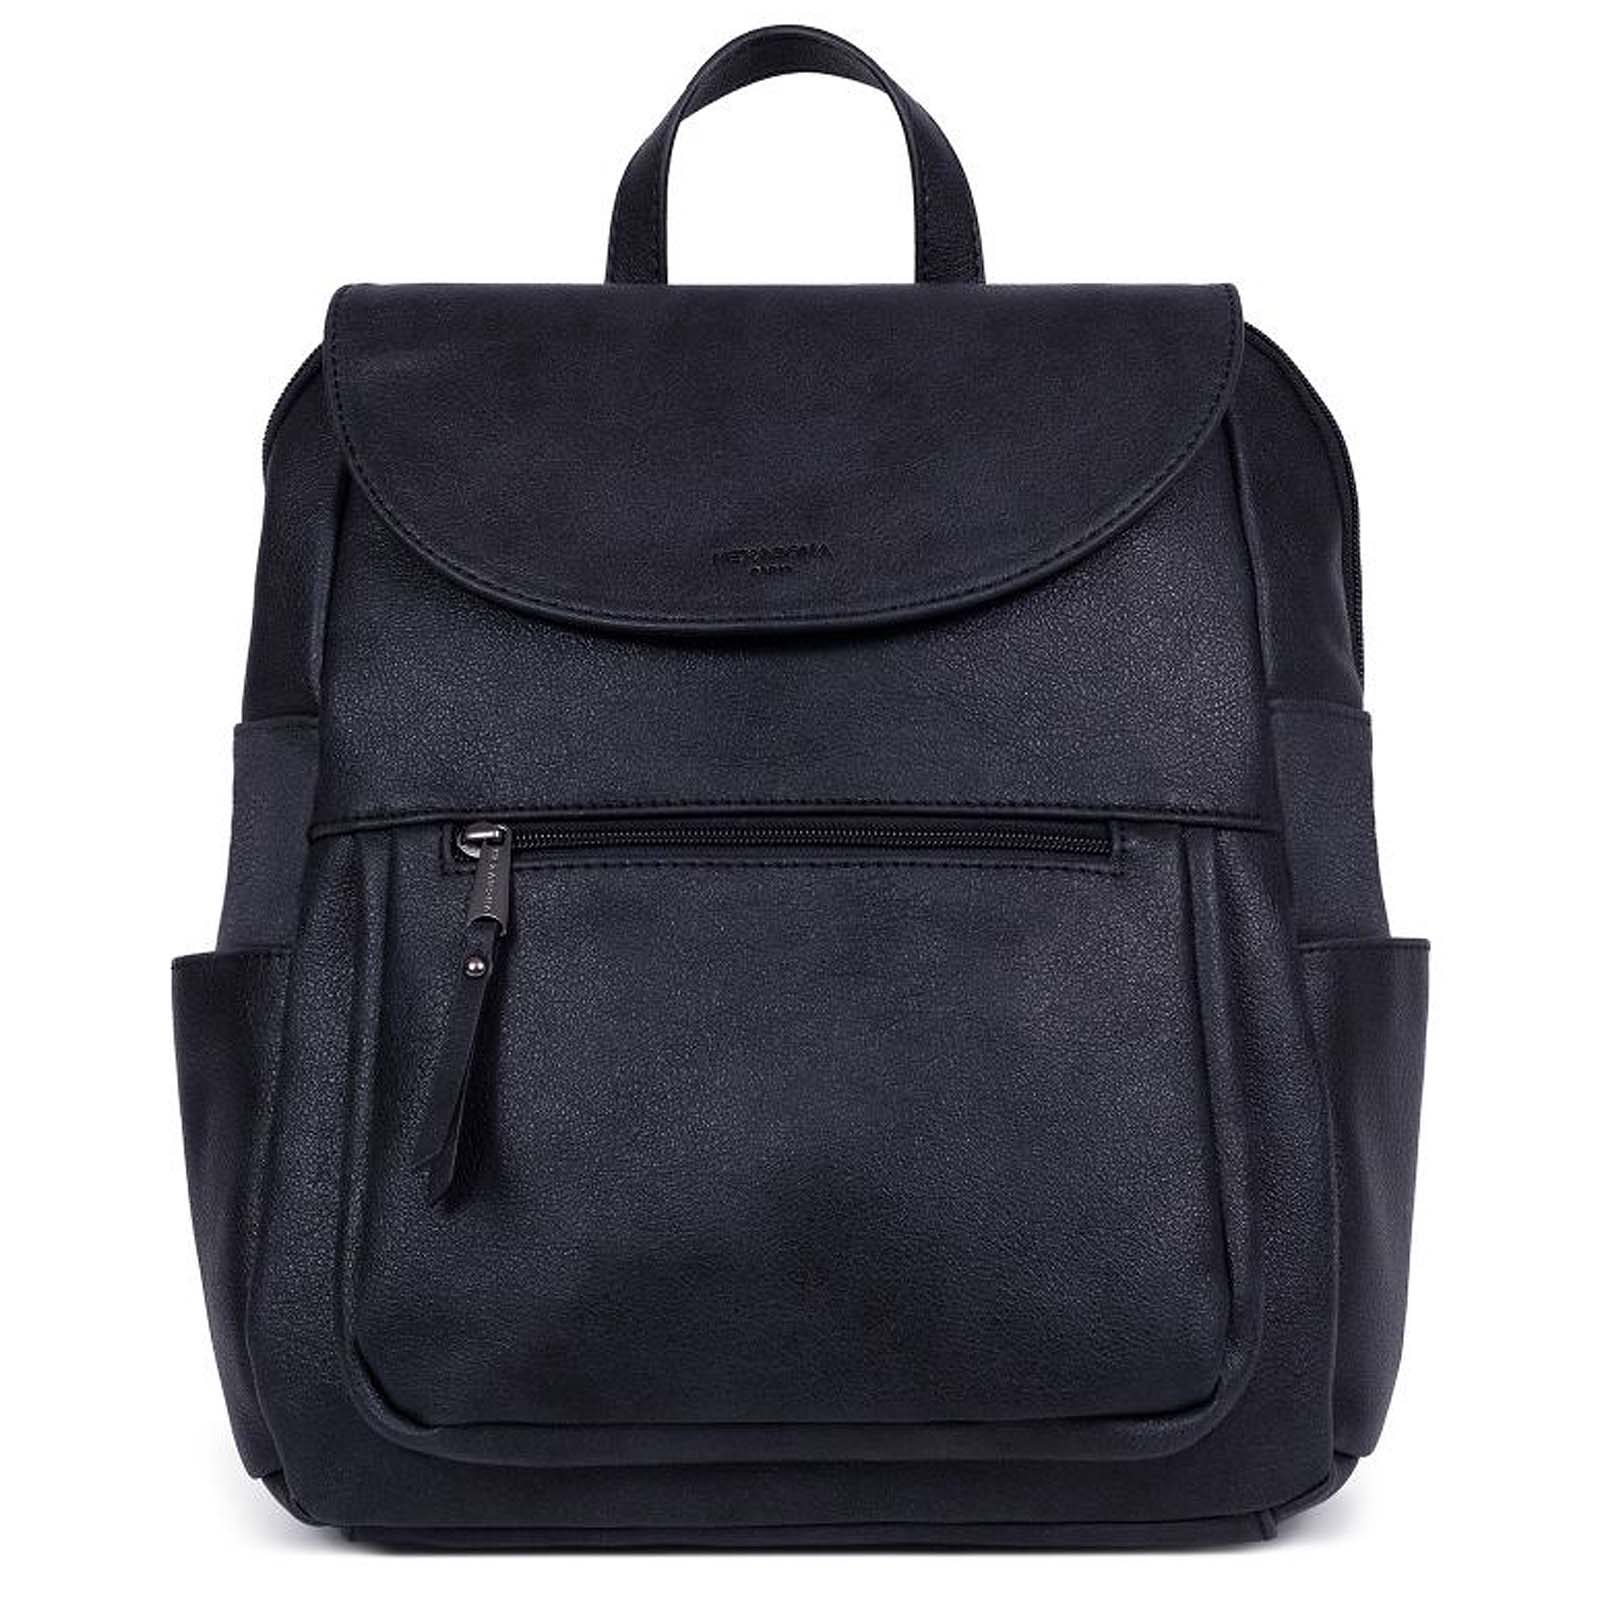 Dámsky batoh čierny - Hexagona Dahoman